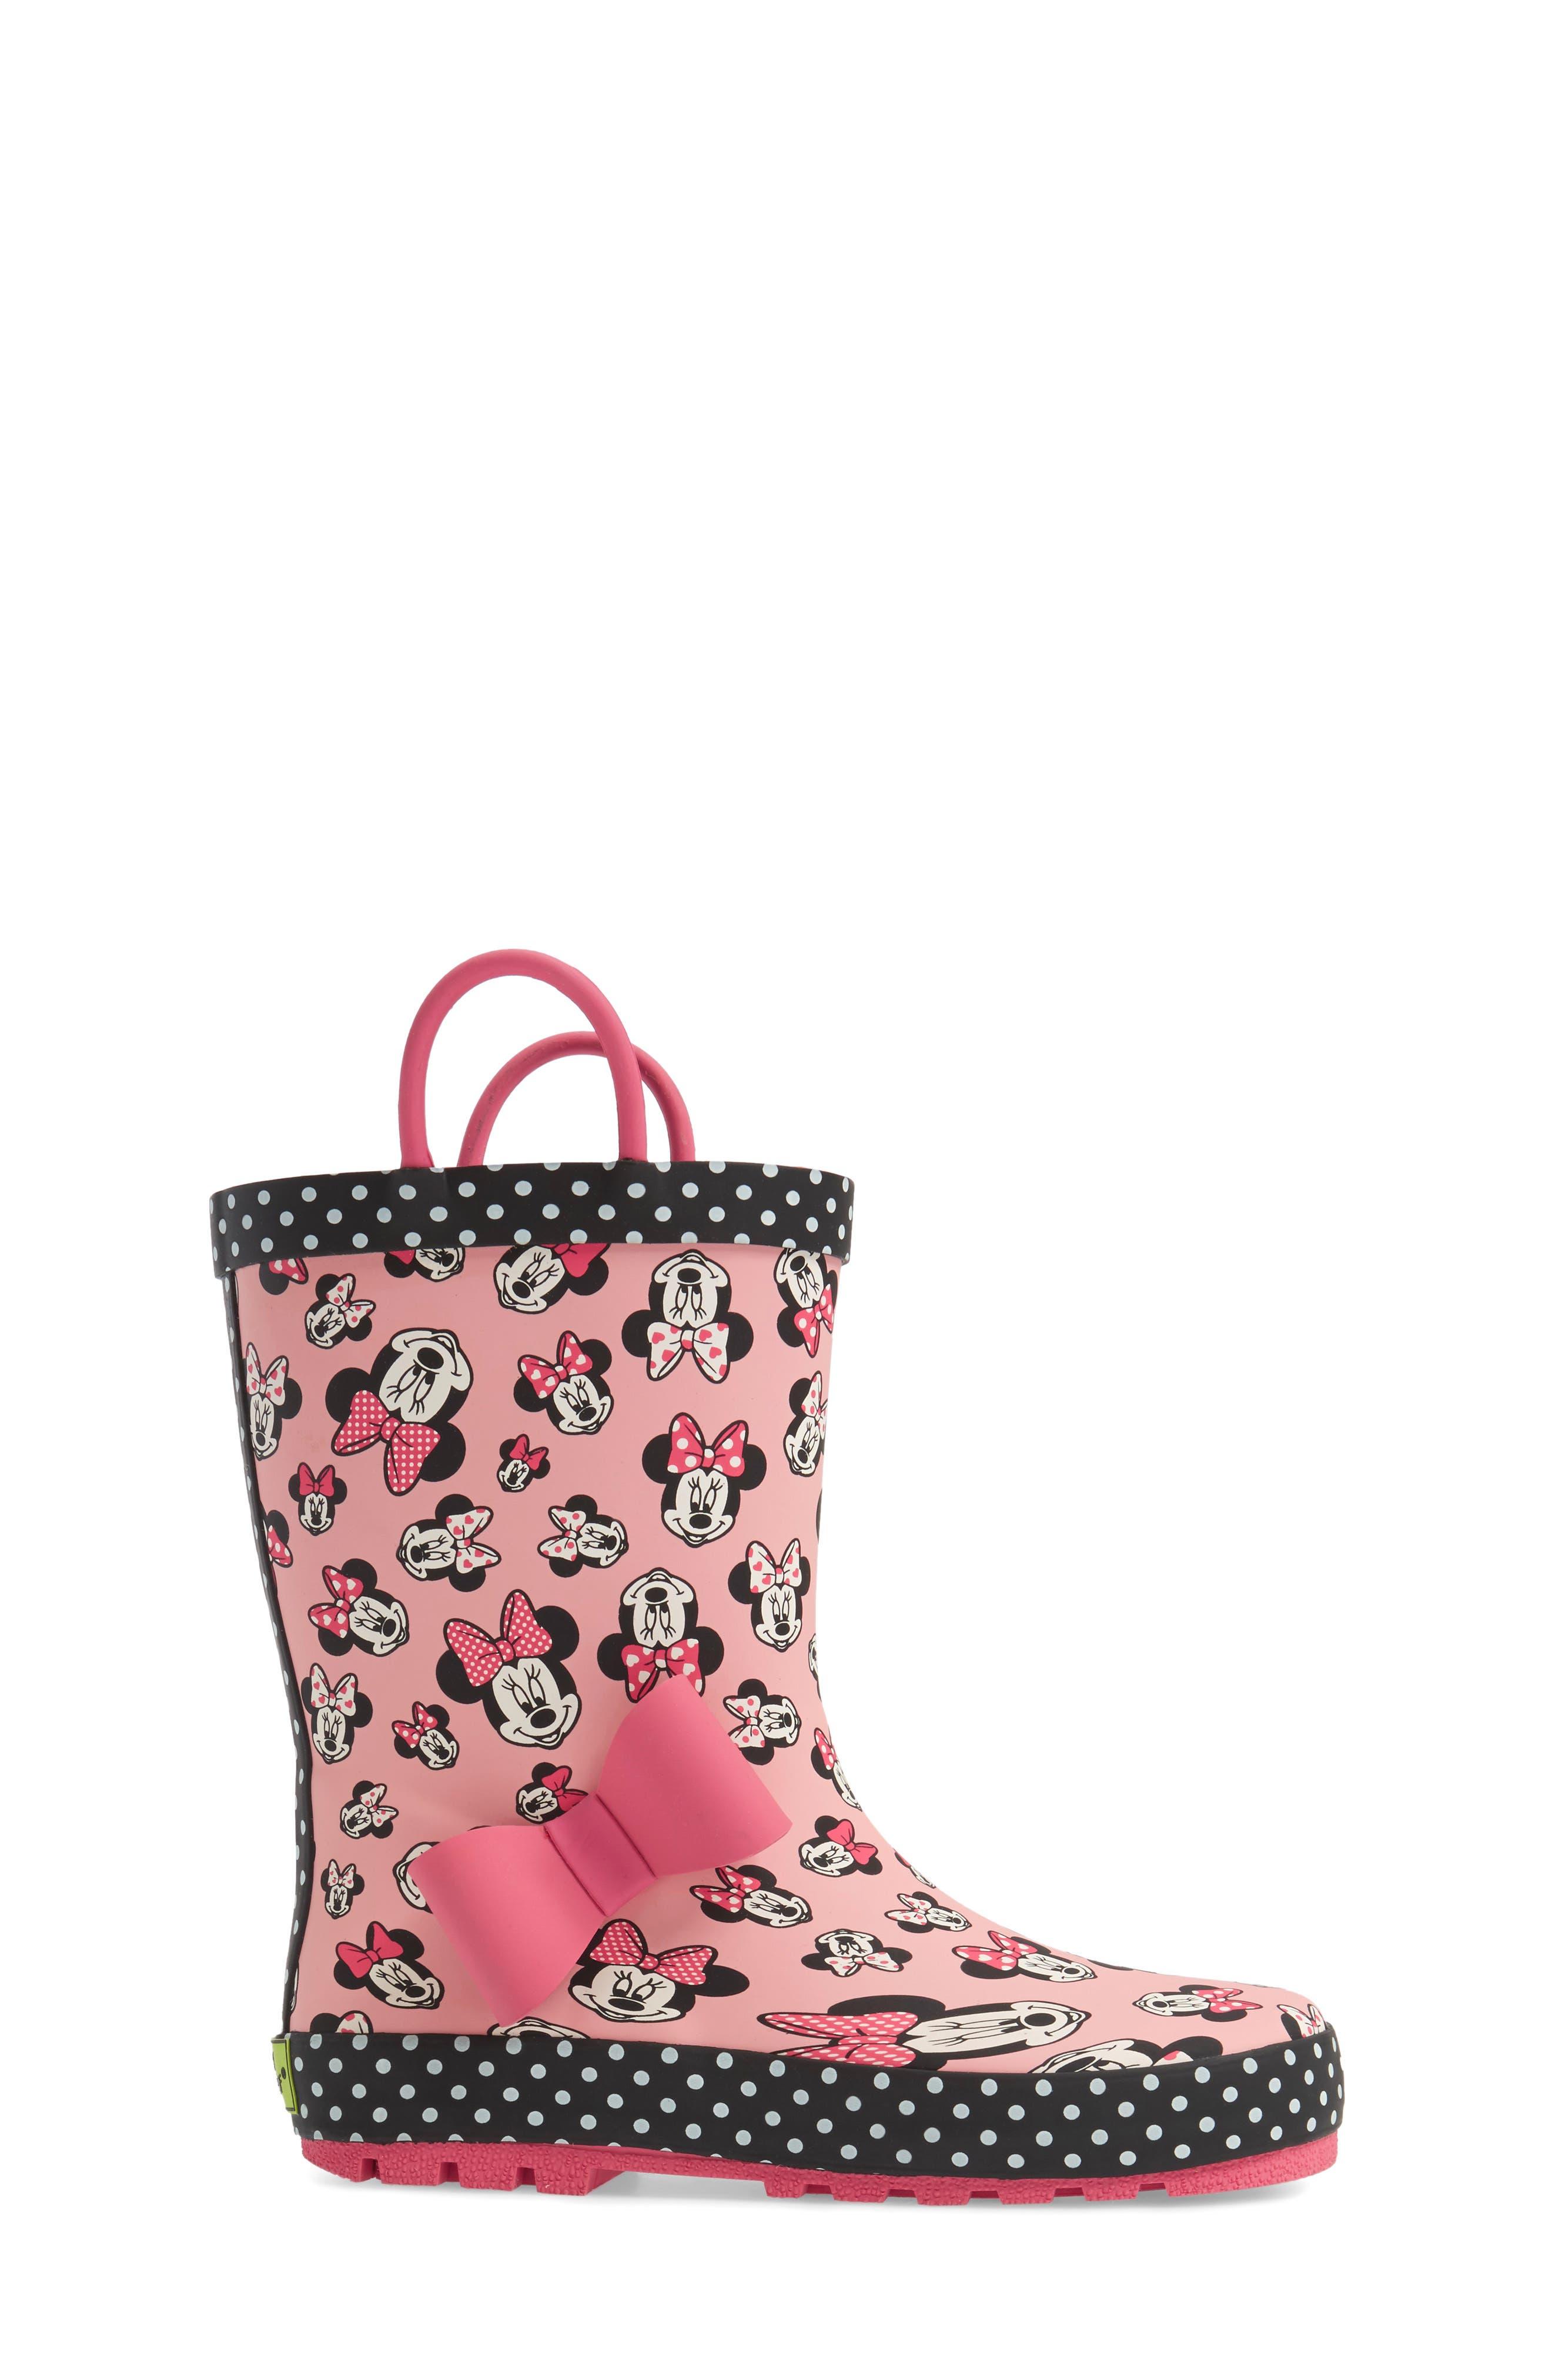 Disney<sup>®</sup> Minnie Mouse Waterproof Rain Boot,                             Alternate thumbnail 3, color,                             680